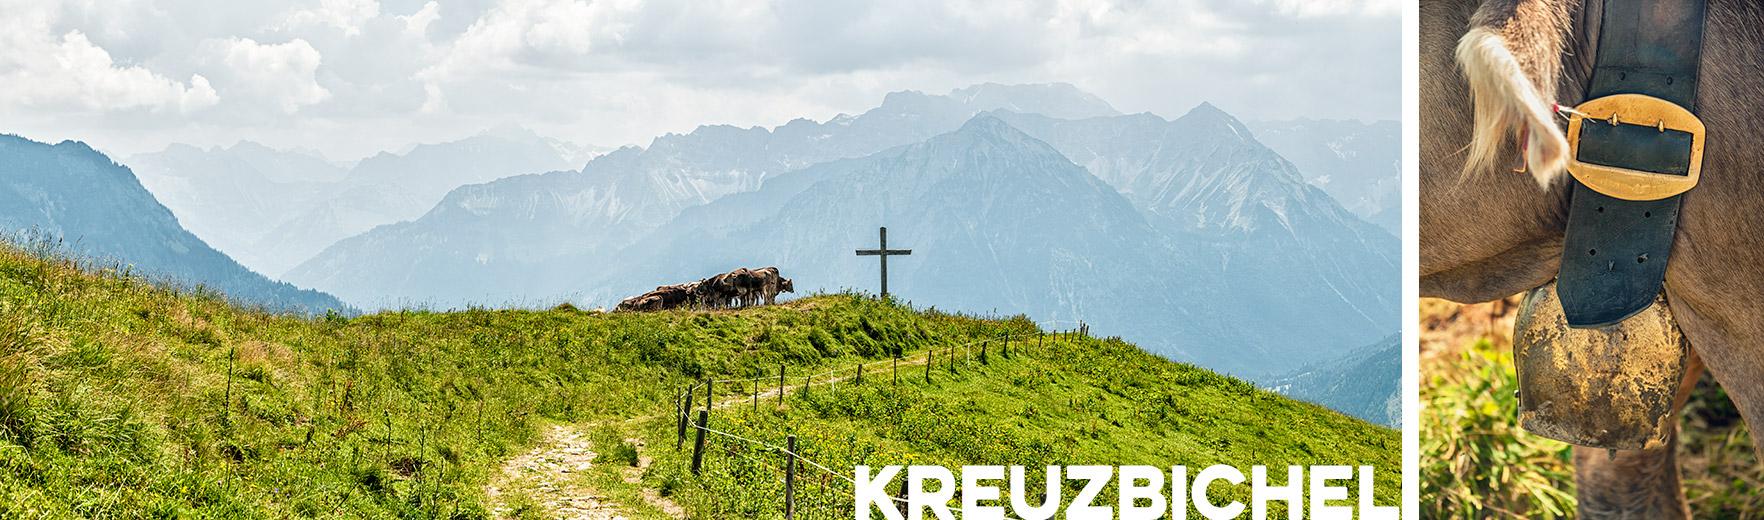 Kreuzbichel, JV